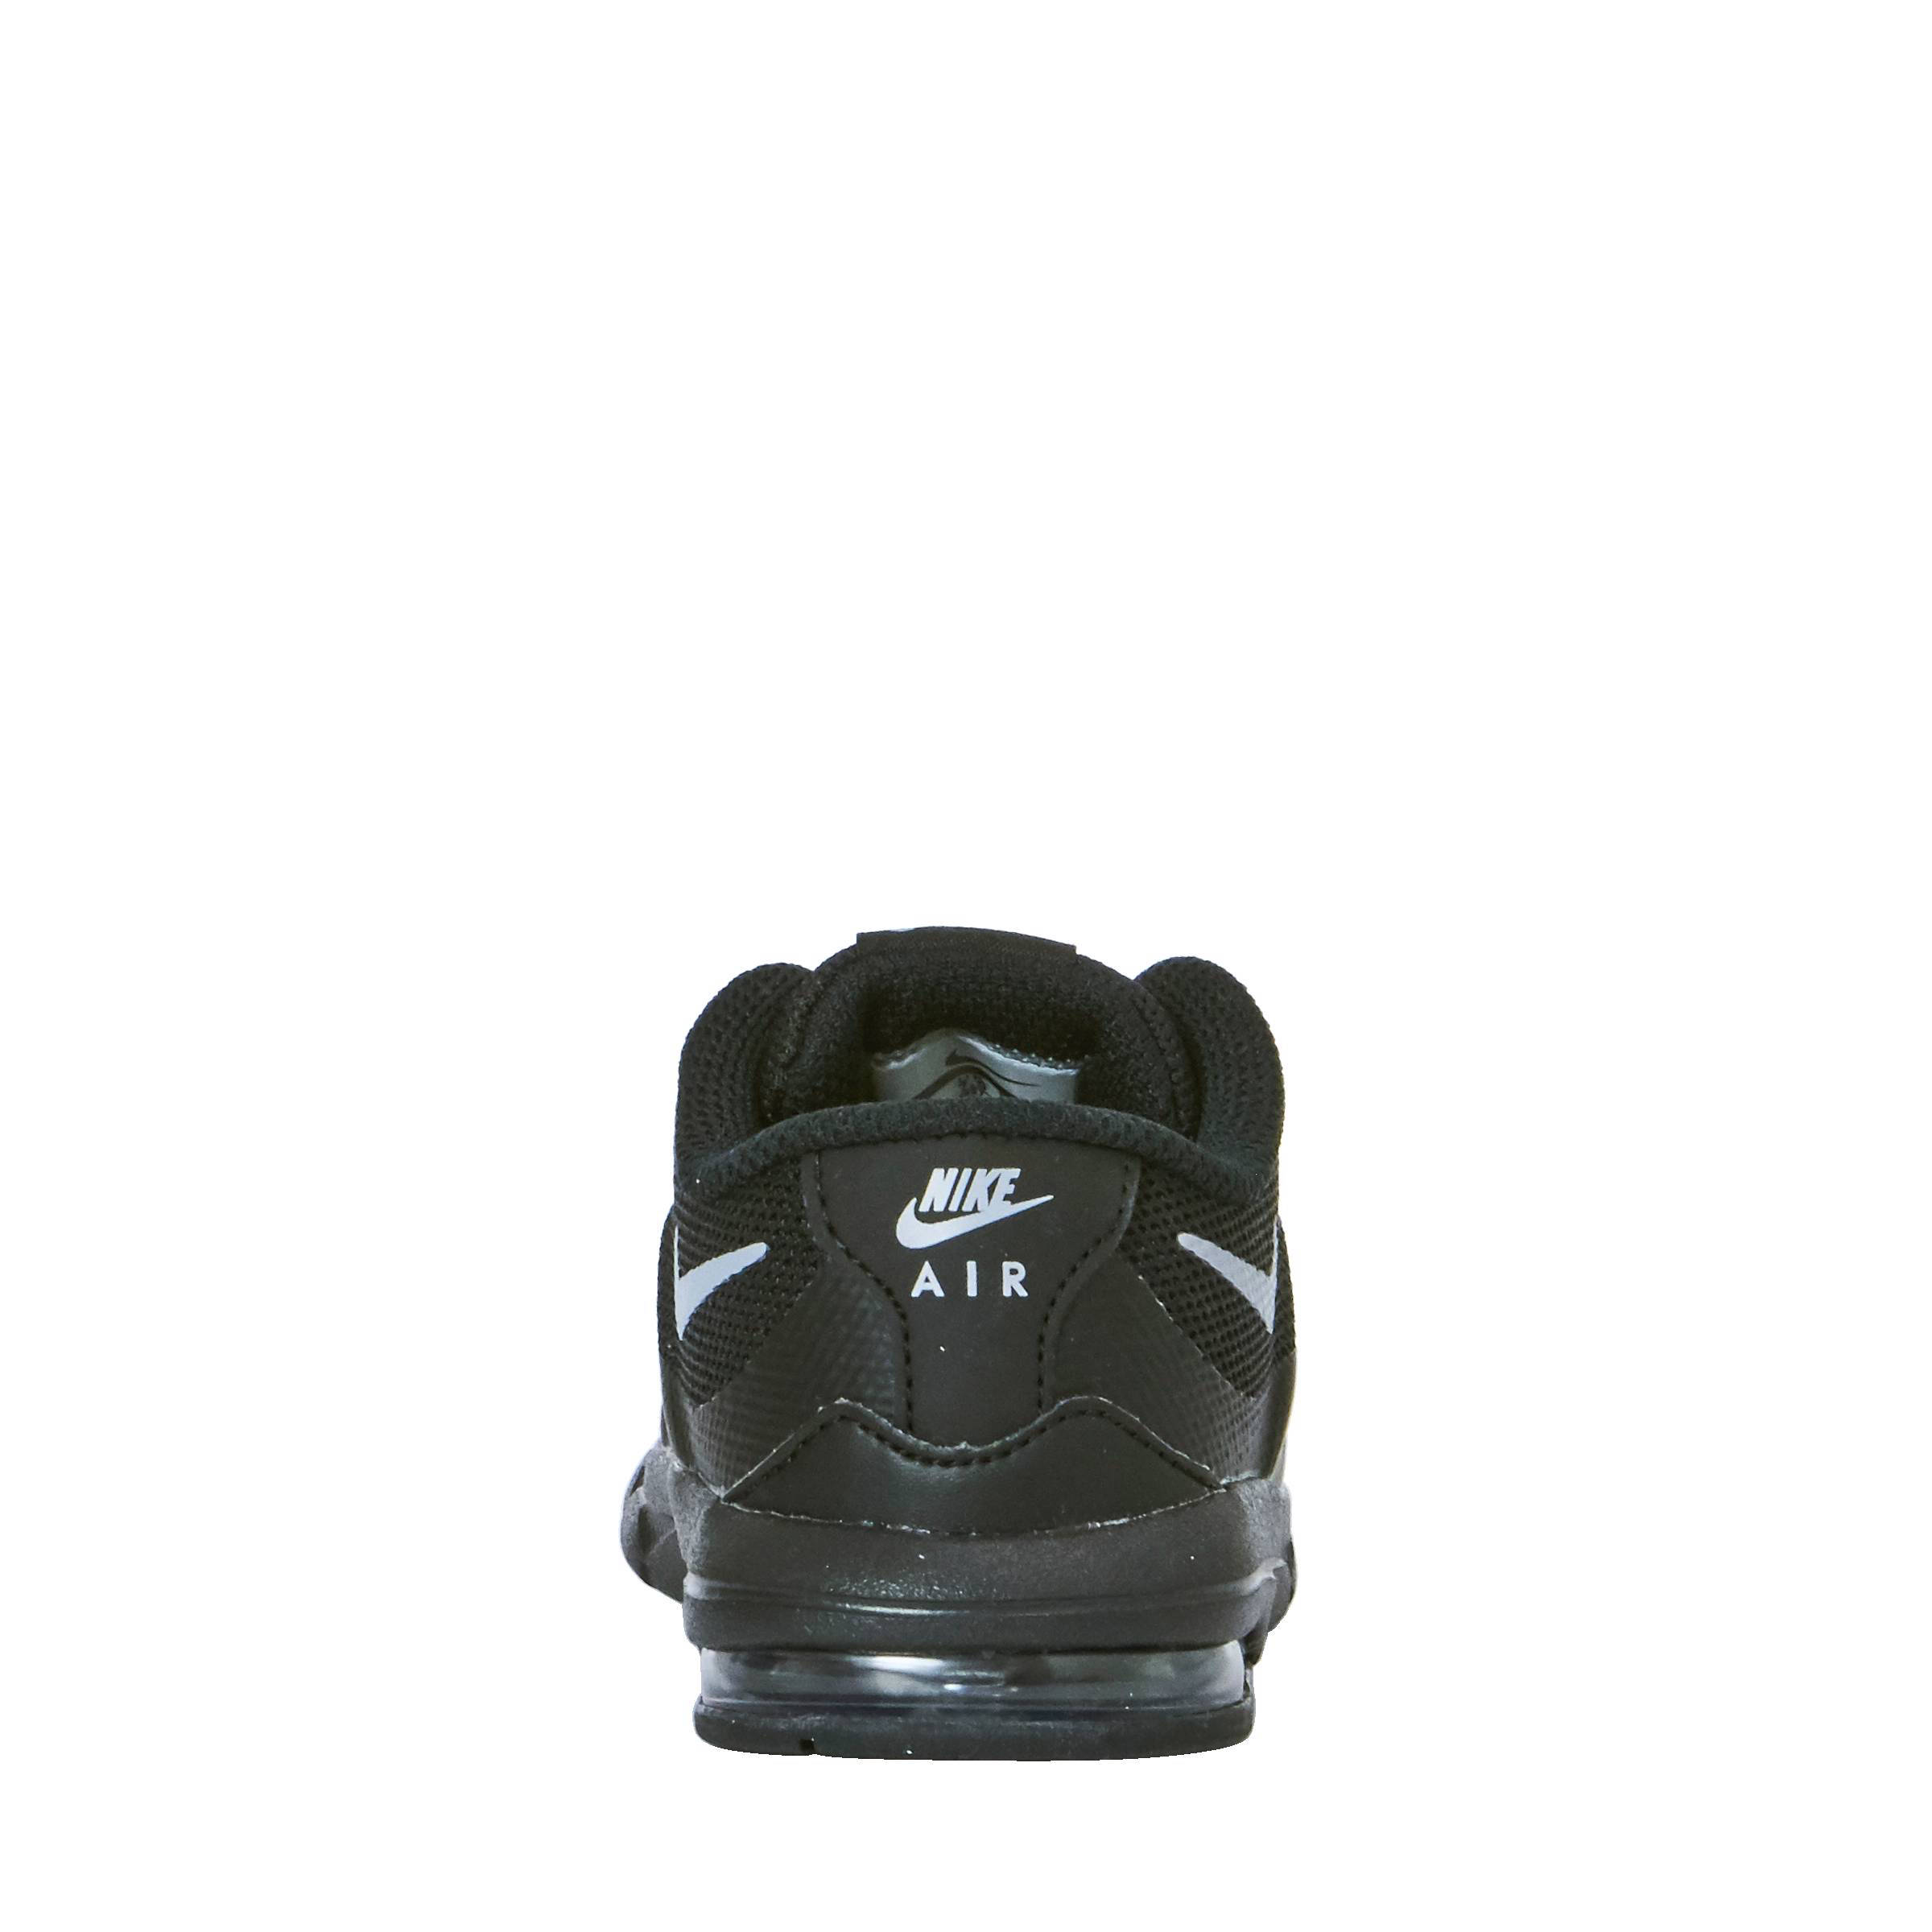 info for 05429 23043 nike-air-max-invigor-sneakers-zwart-0888410285145.jpg